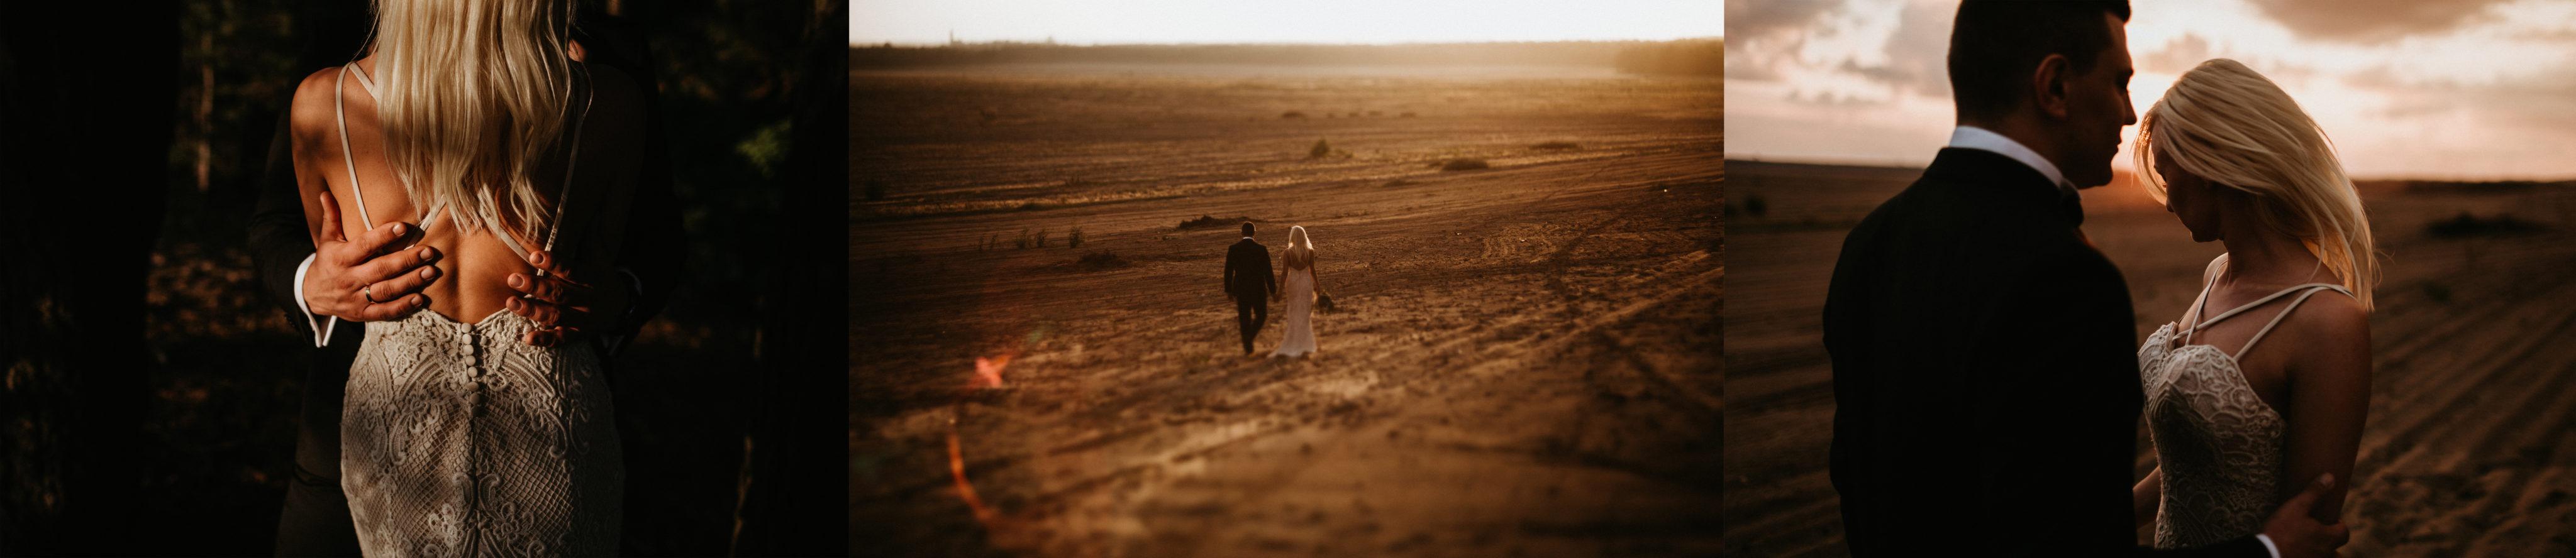 miejsca na plener slubny pustynia bledowska